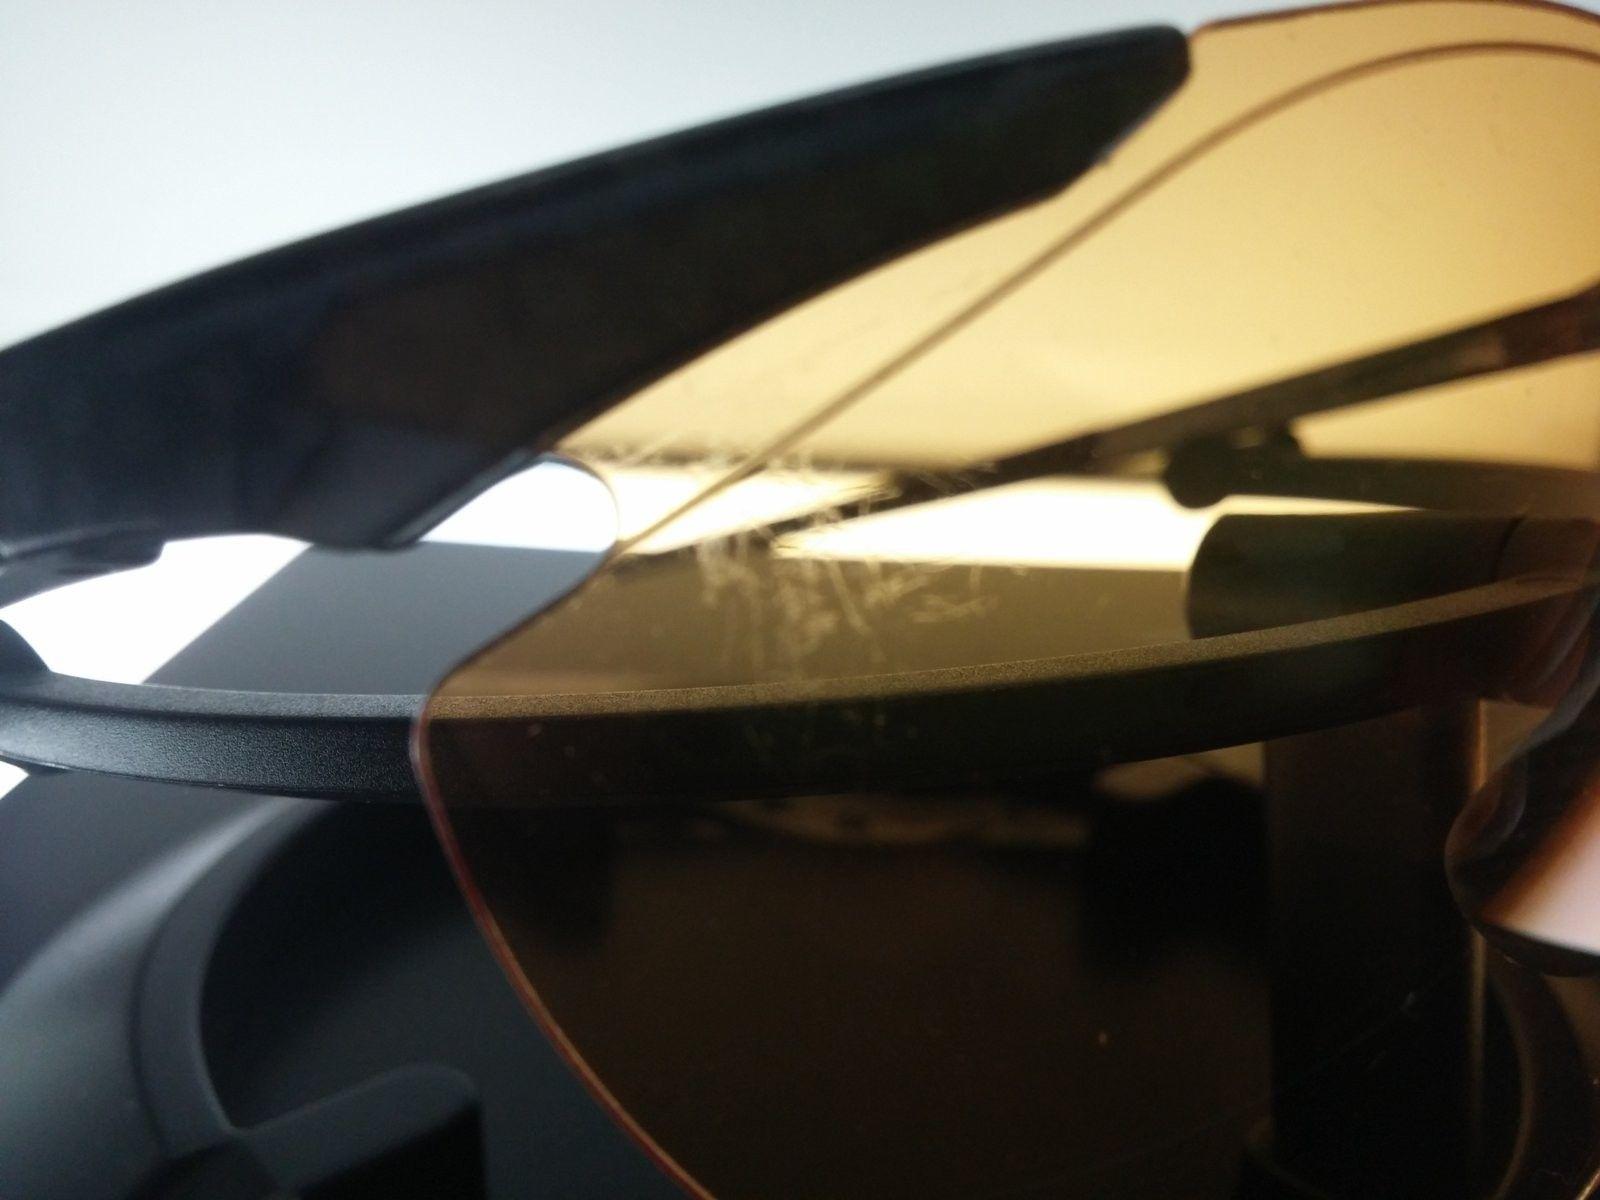 Oakley ZERO 0.6 CARBON FIBER PERSIMMON - 20160908_123956.jpg